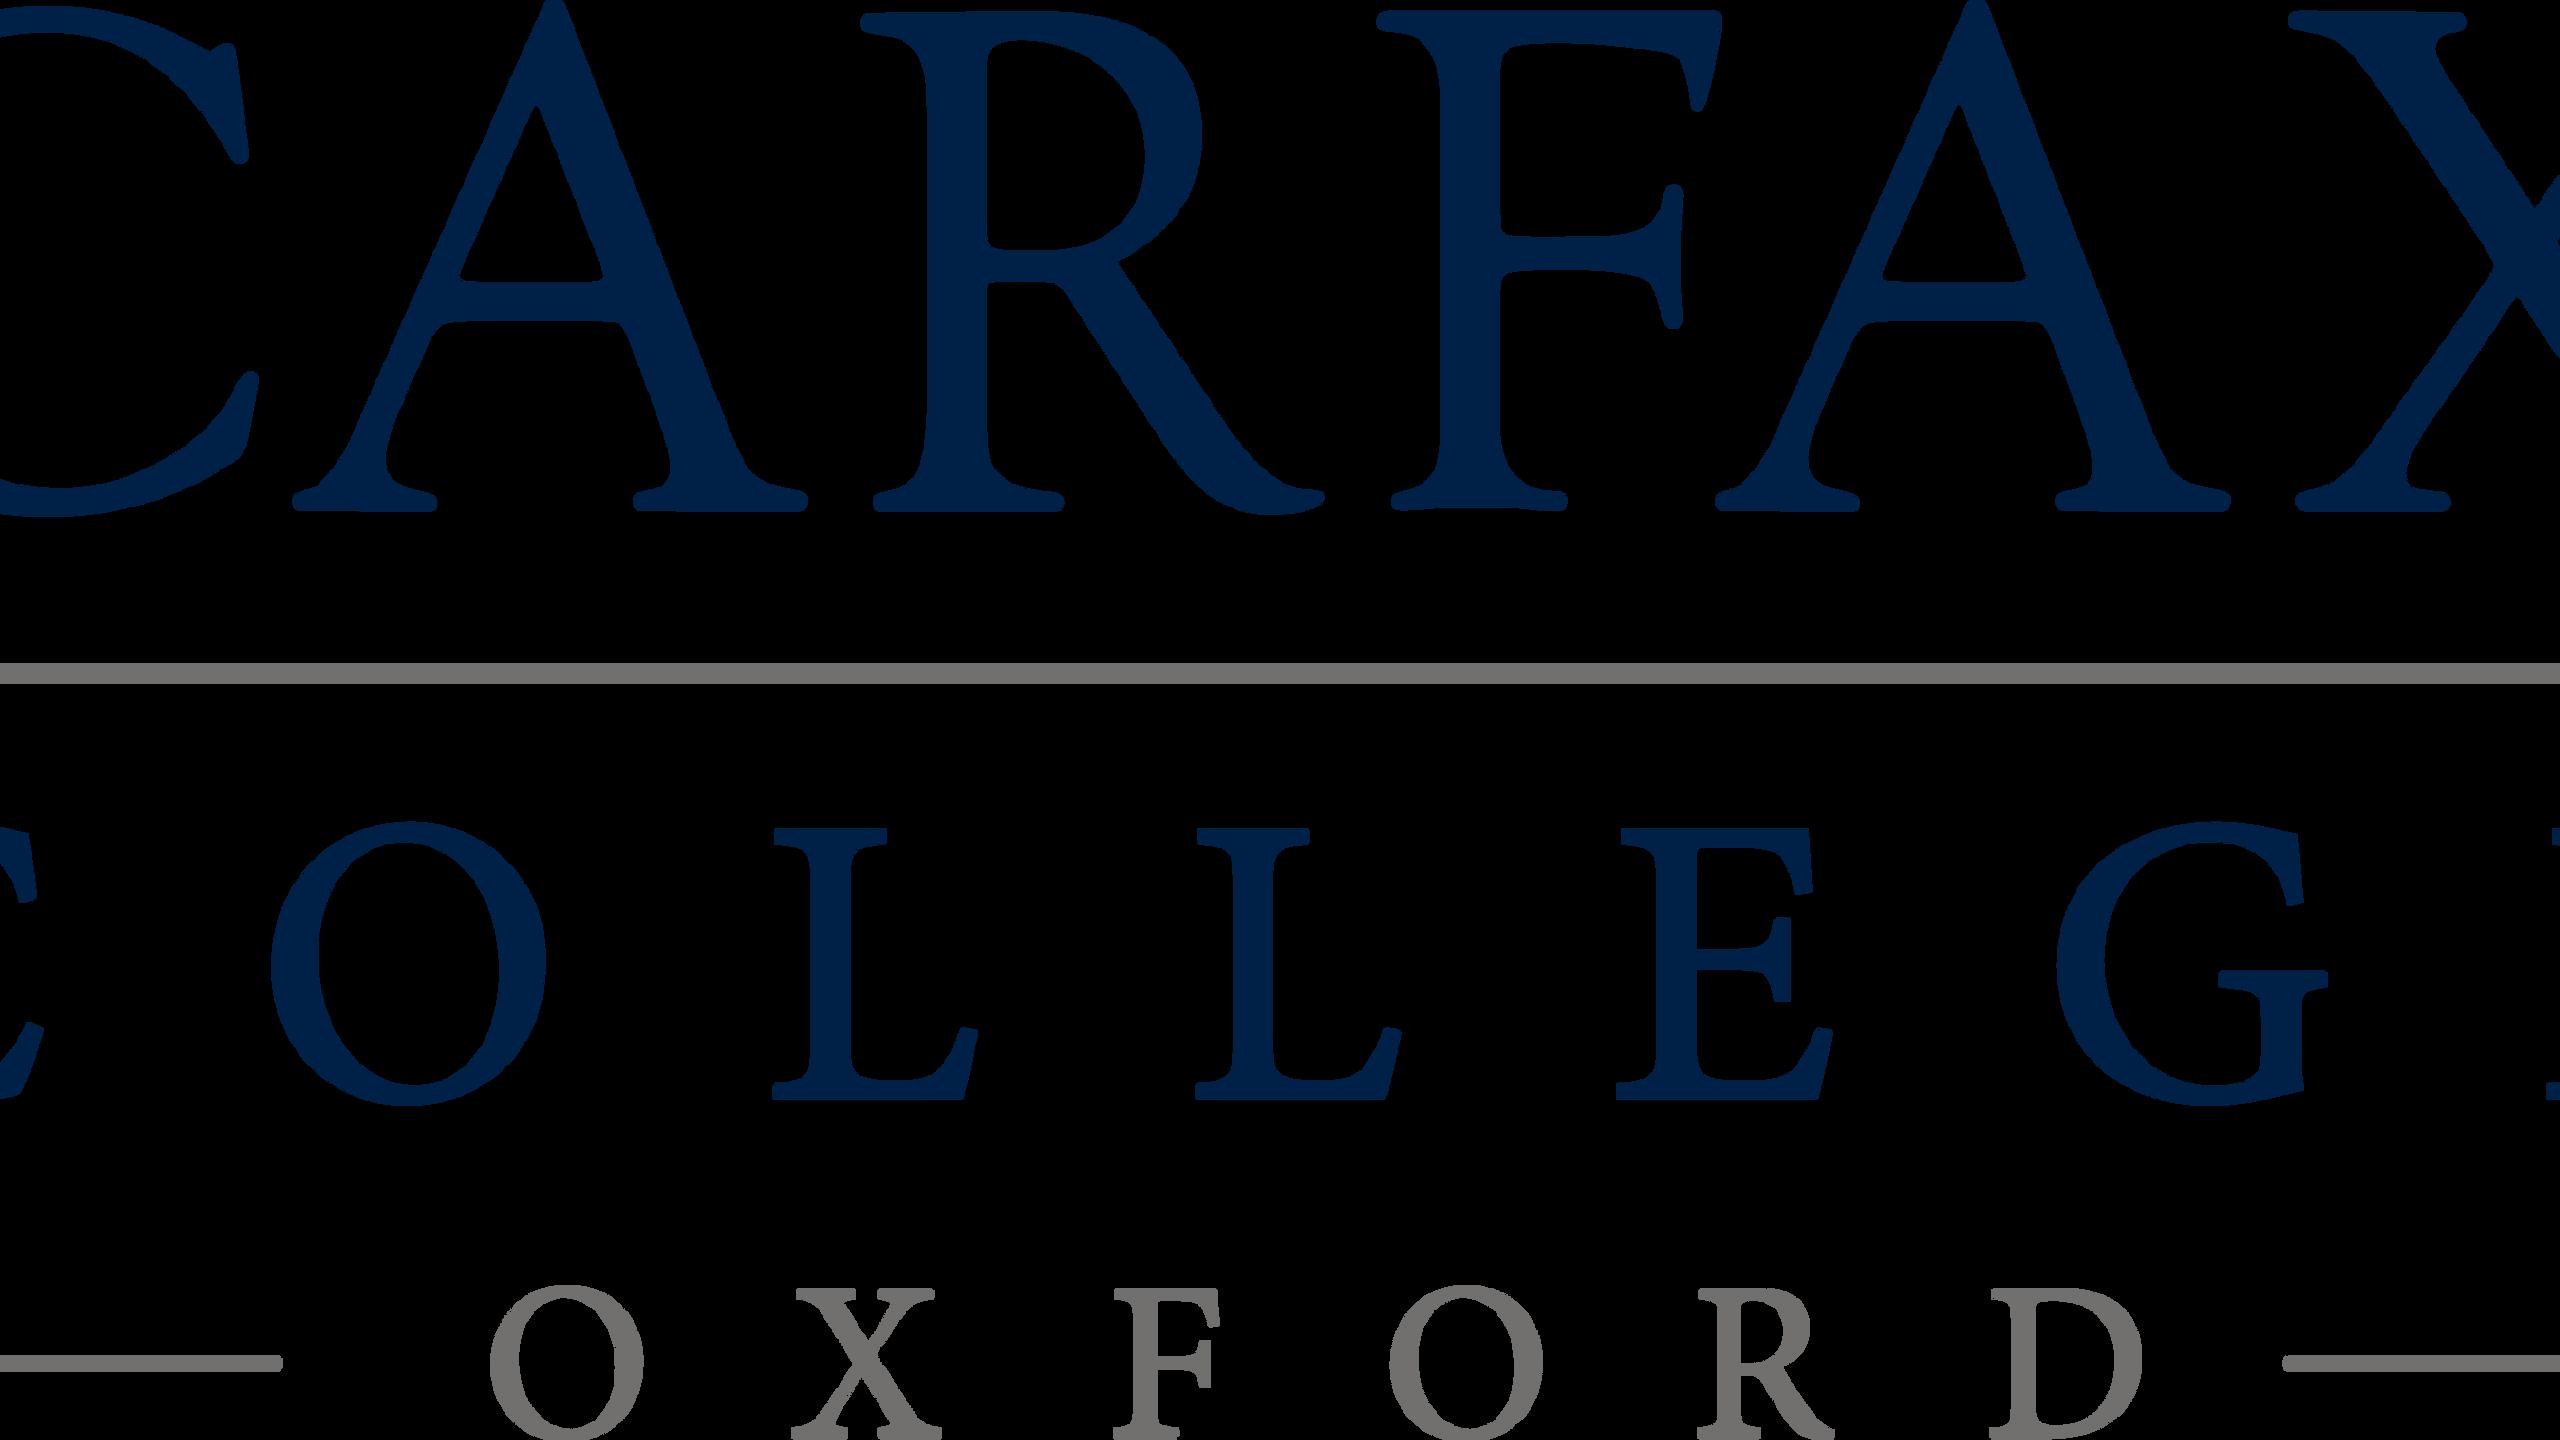 Carfax College New Logo